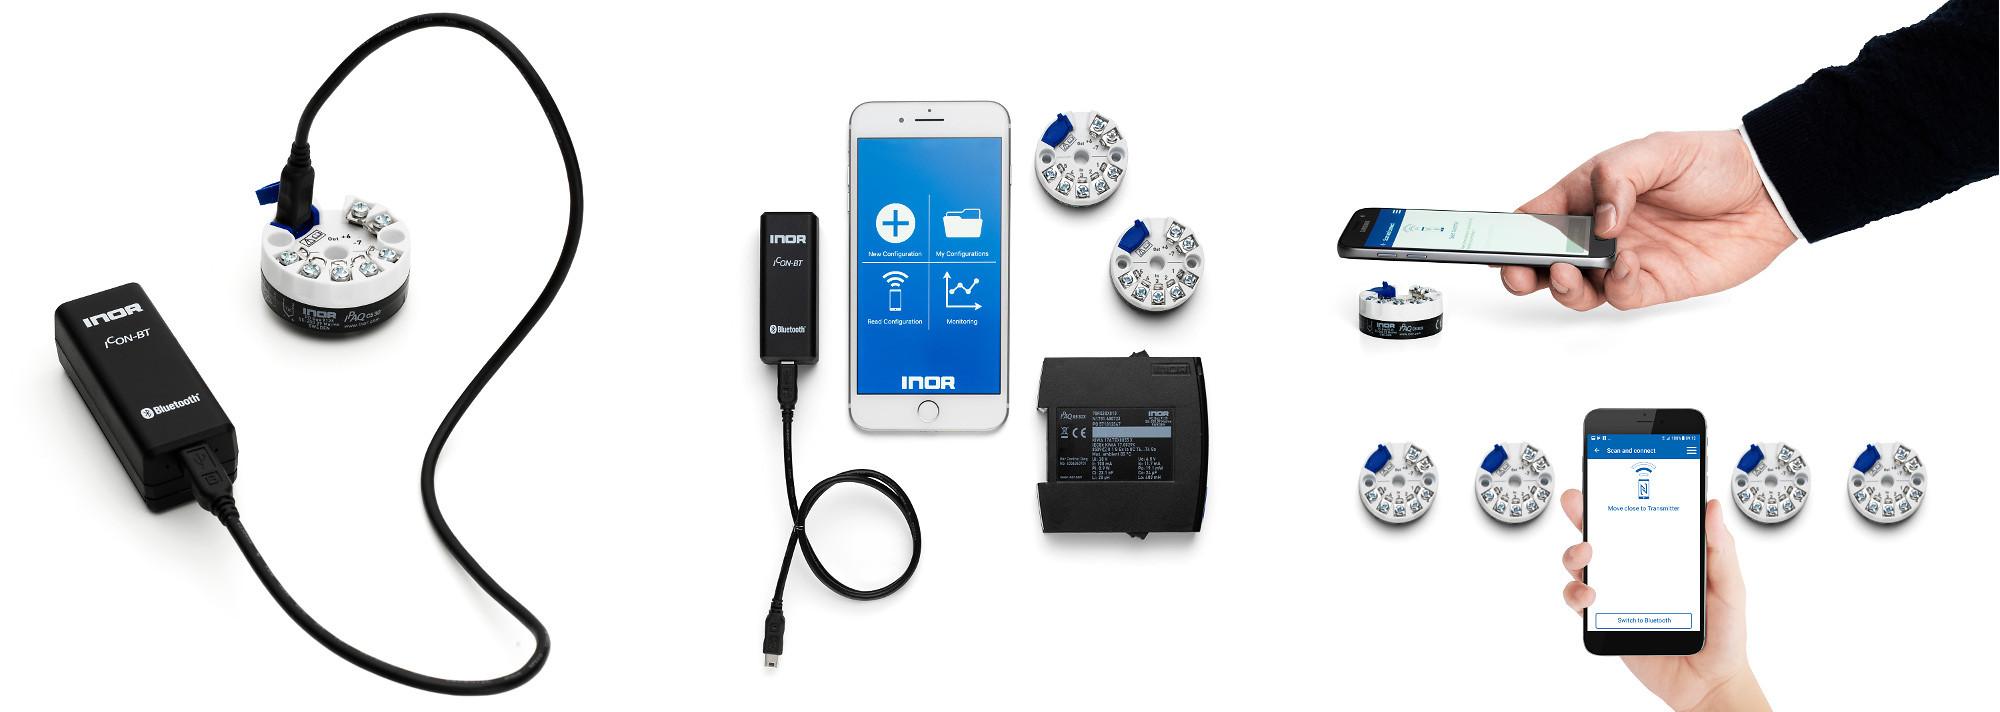 Langkamp Technology - Transmitters with Wireless communication; IPAQ 530